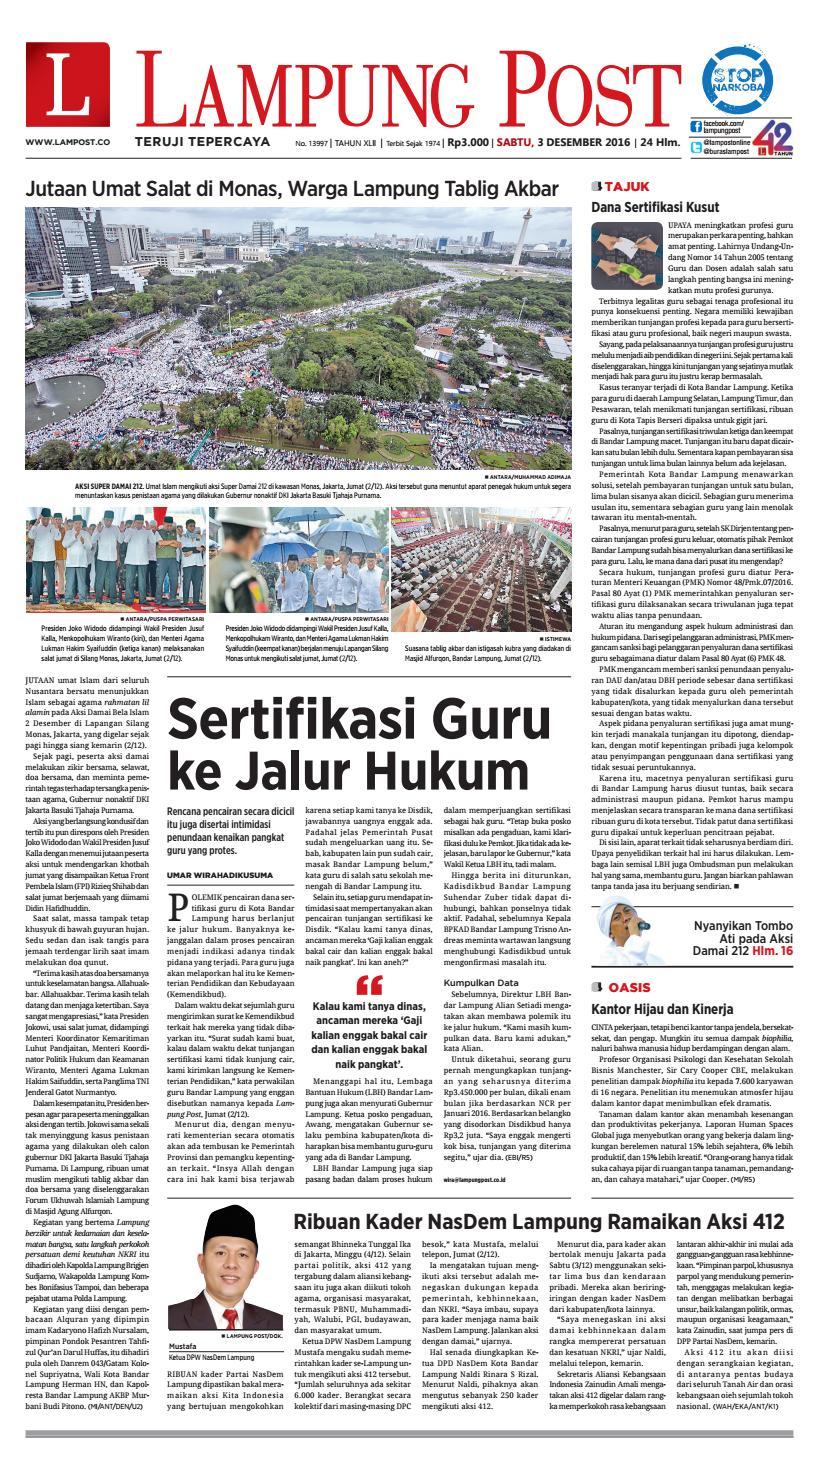 Lampung Post Sabtu 3 Desember 2016 By Issuu Produk Ukm Bumn Sulam Usus Pmk